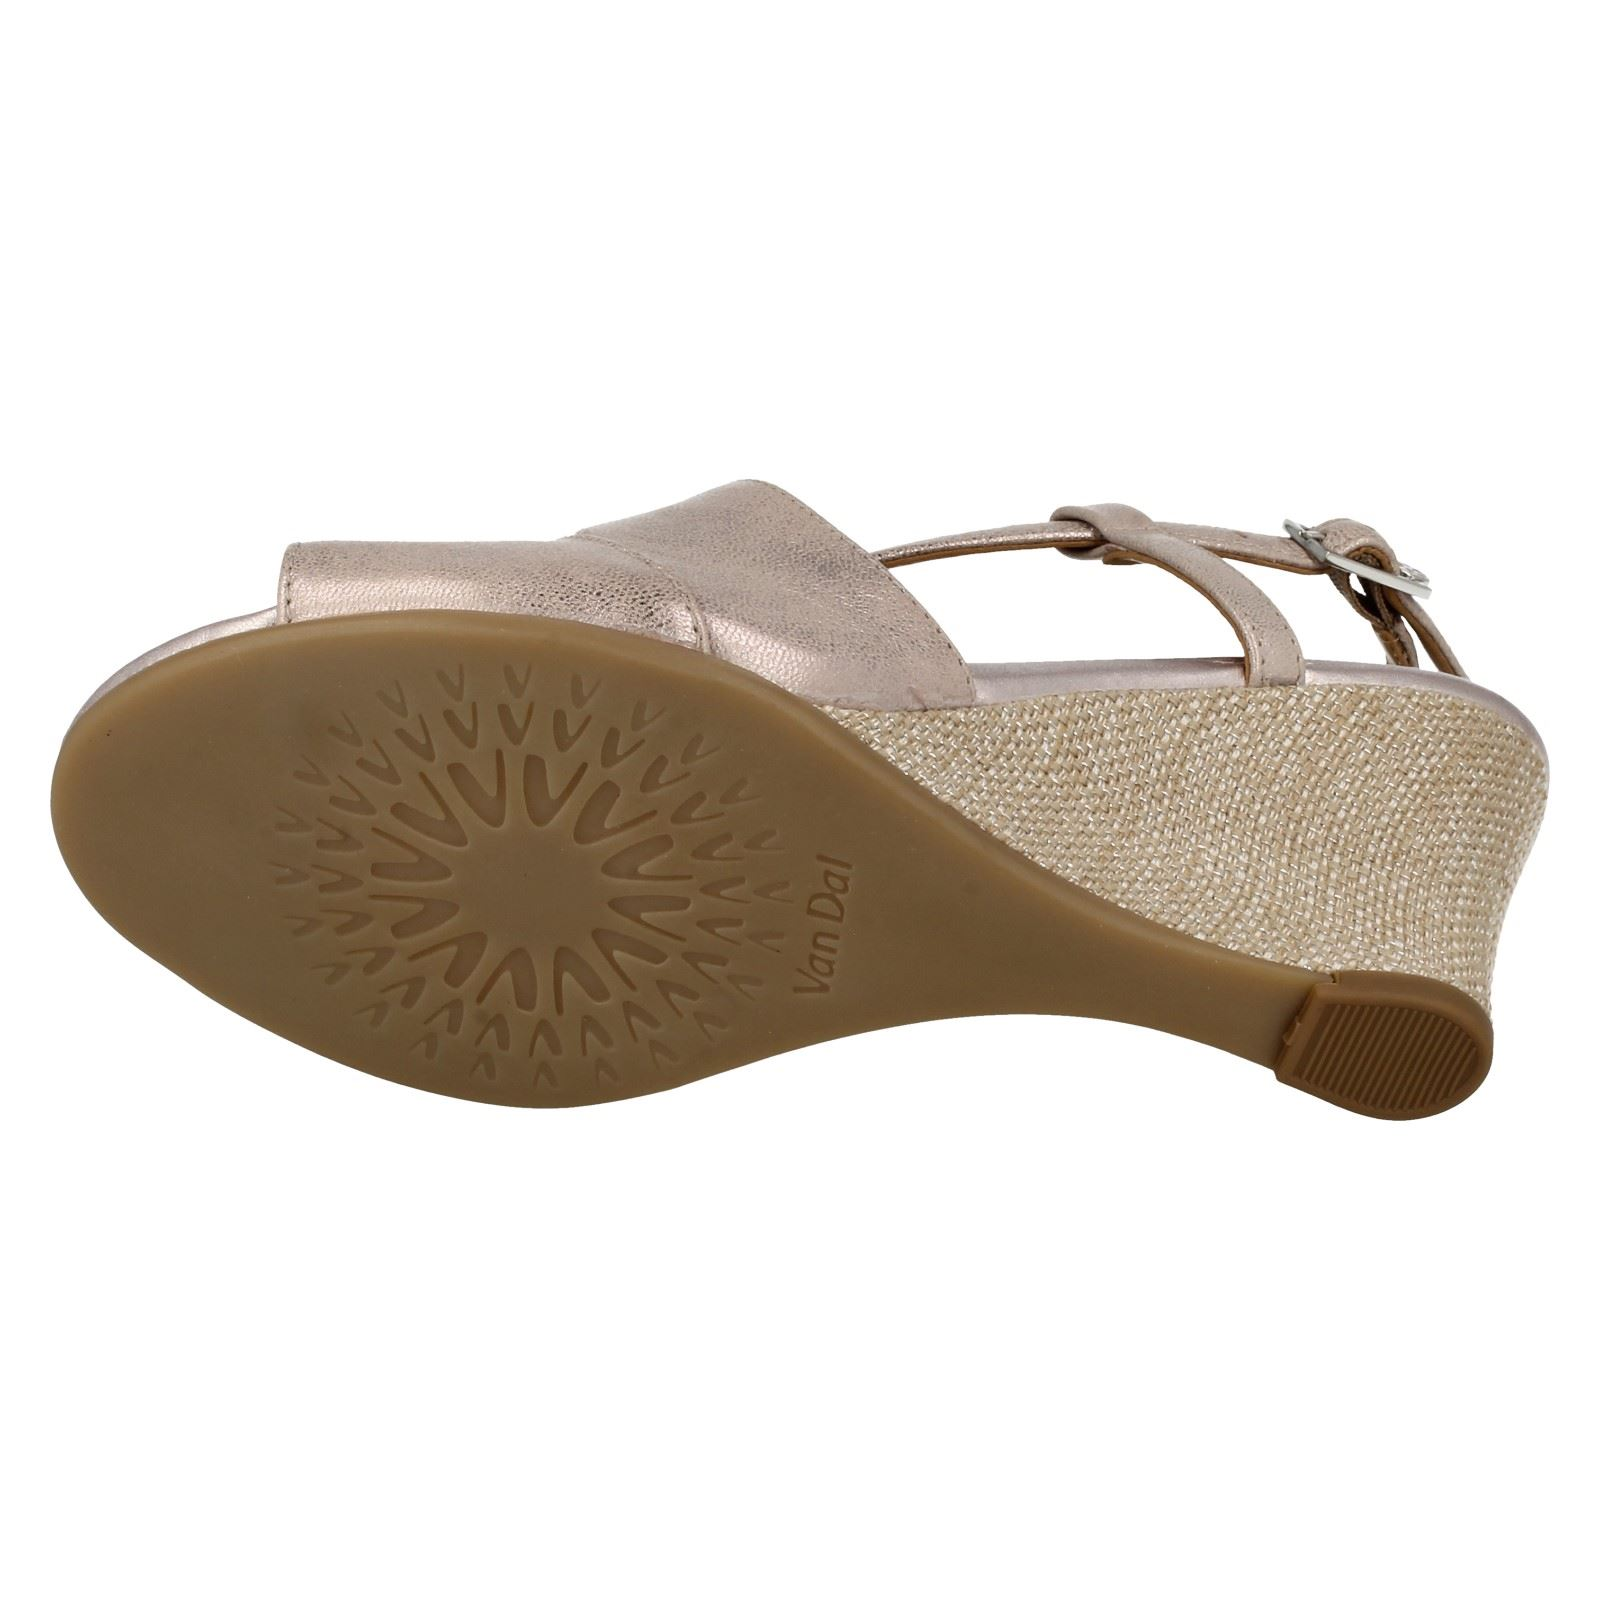 Ladies-Van-Dal-Cross-Strap-Wedged-Sandal-Allora thumbnail 8